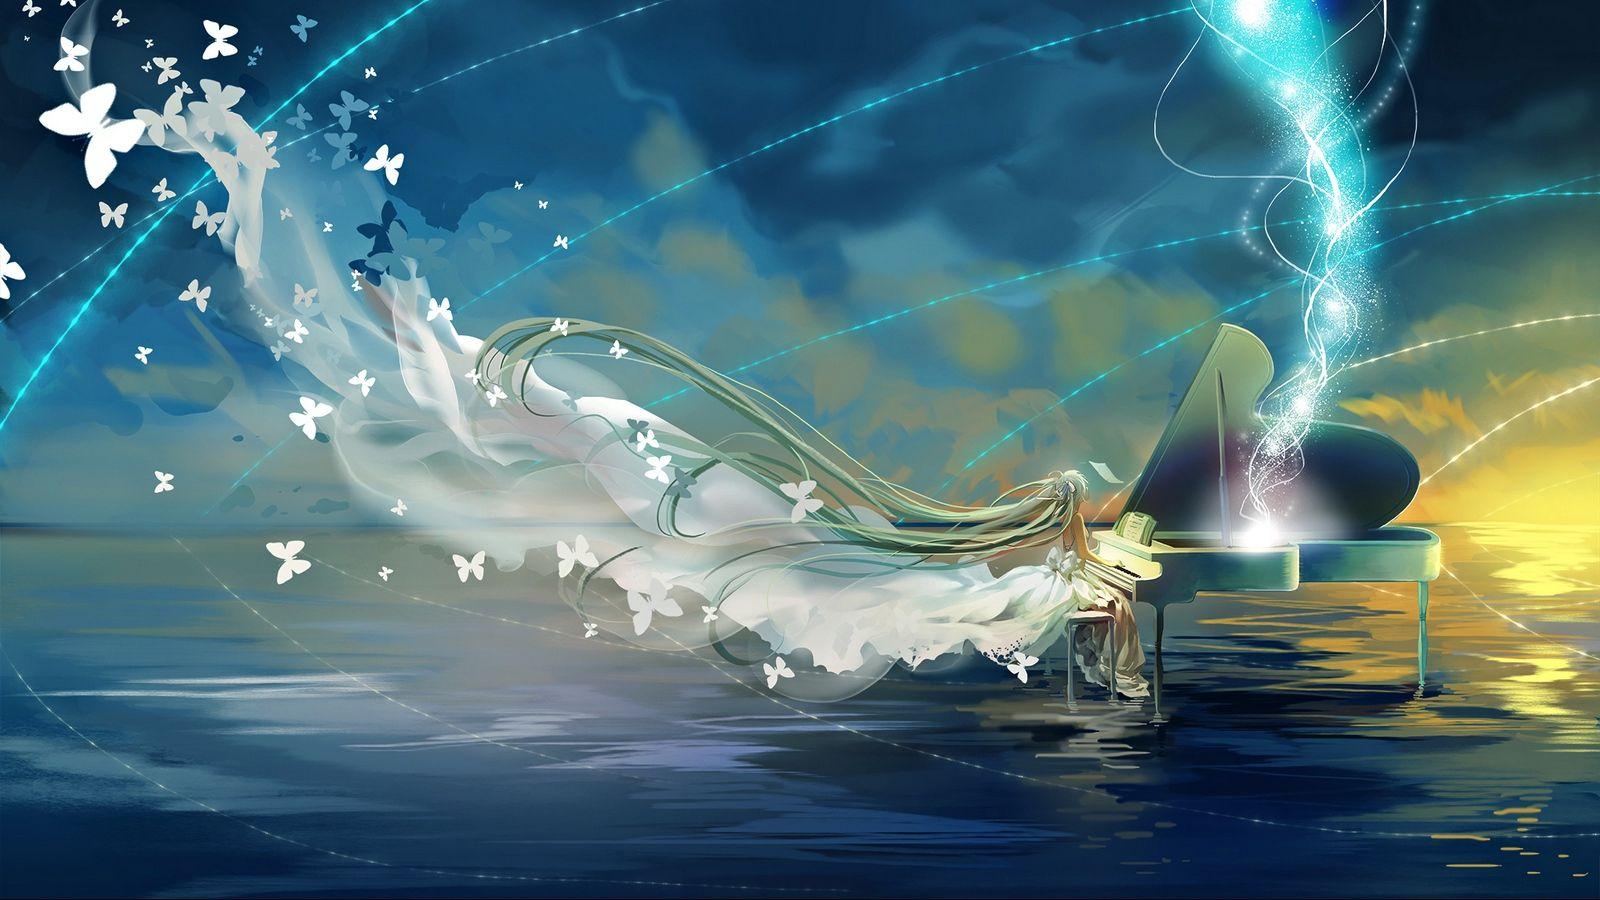 Download Wallpaper 1600x900 Vocaloid Hatsune Miku Piano Sky Butterfly Widescreen 16 9 Hd Background Hatsune Miku Anime Wallpaper 1920x1080 Hatsune Anime desktop wallpaper 1600x900